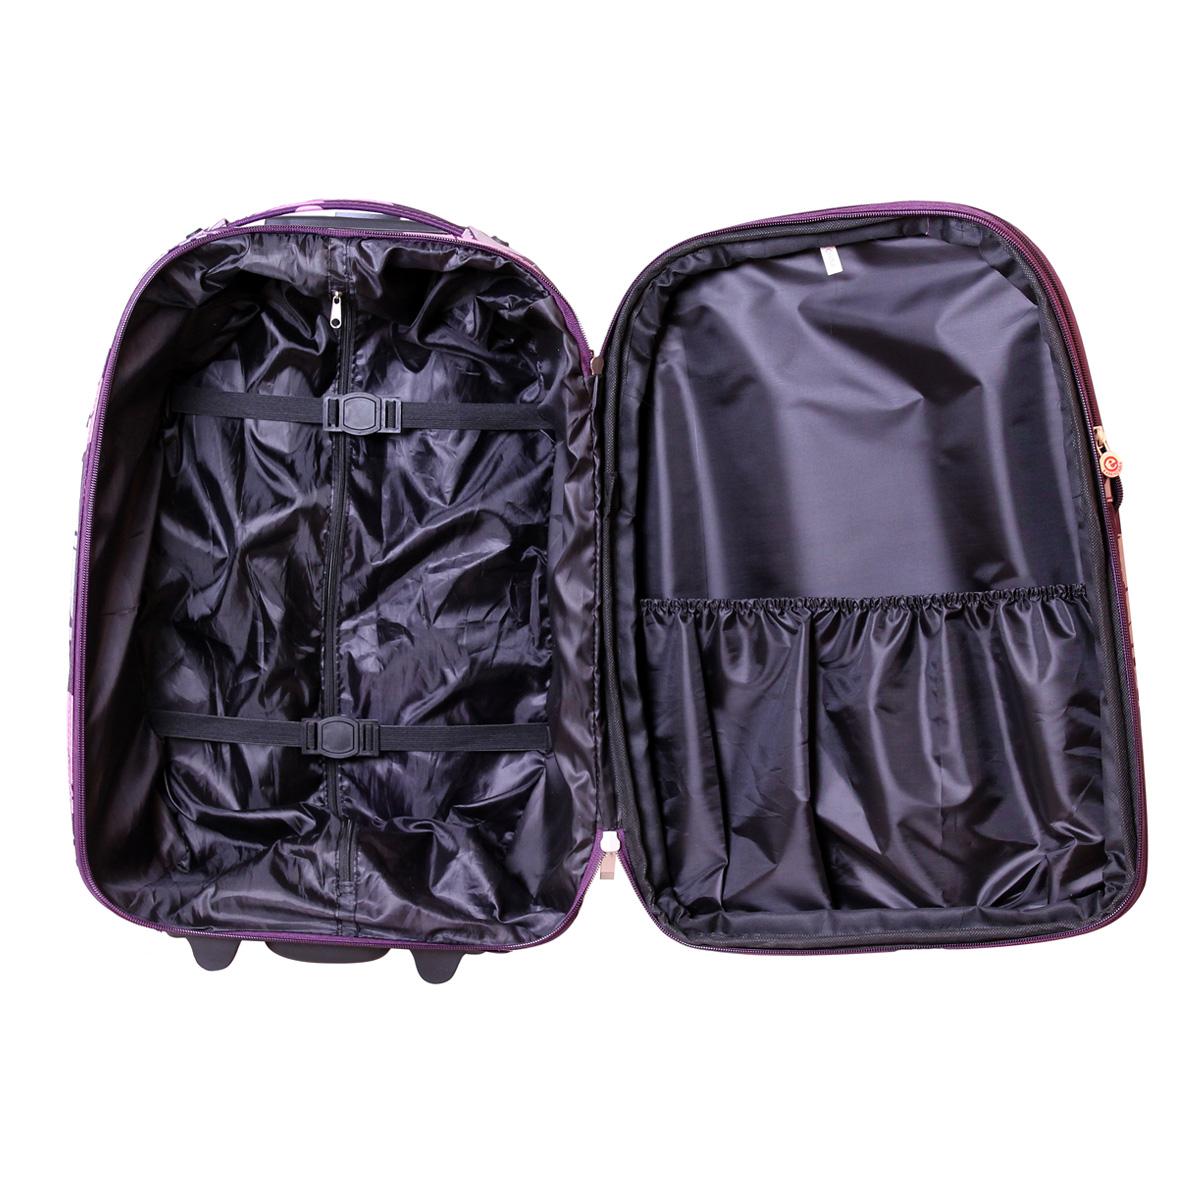 handgep ck reisekoffer trolley reise koffer hibiskus lila 38 liter nylon color3 ebay. Black Bedroom Furniture Sets. Home Design Ideas